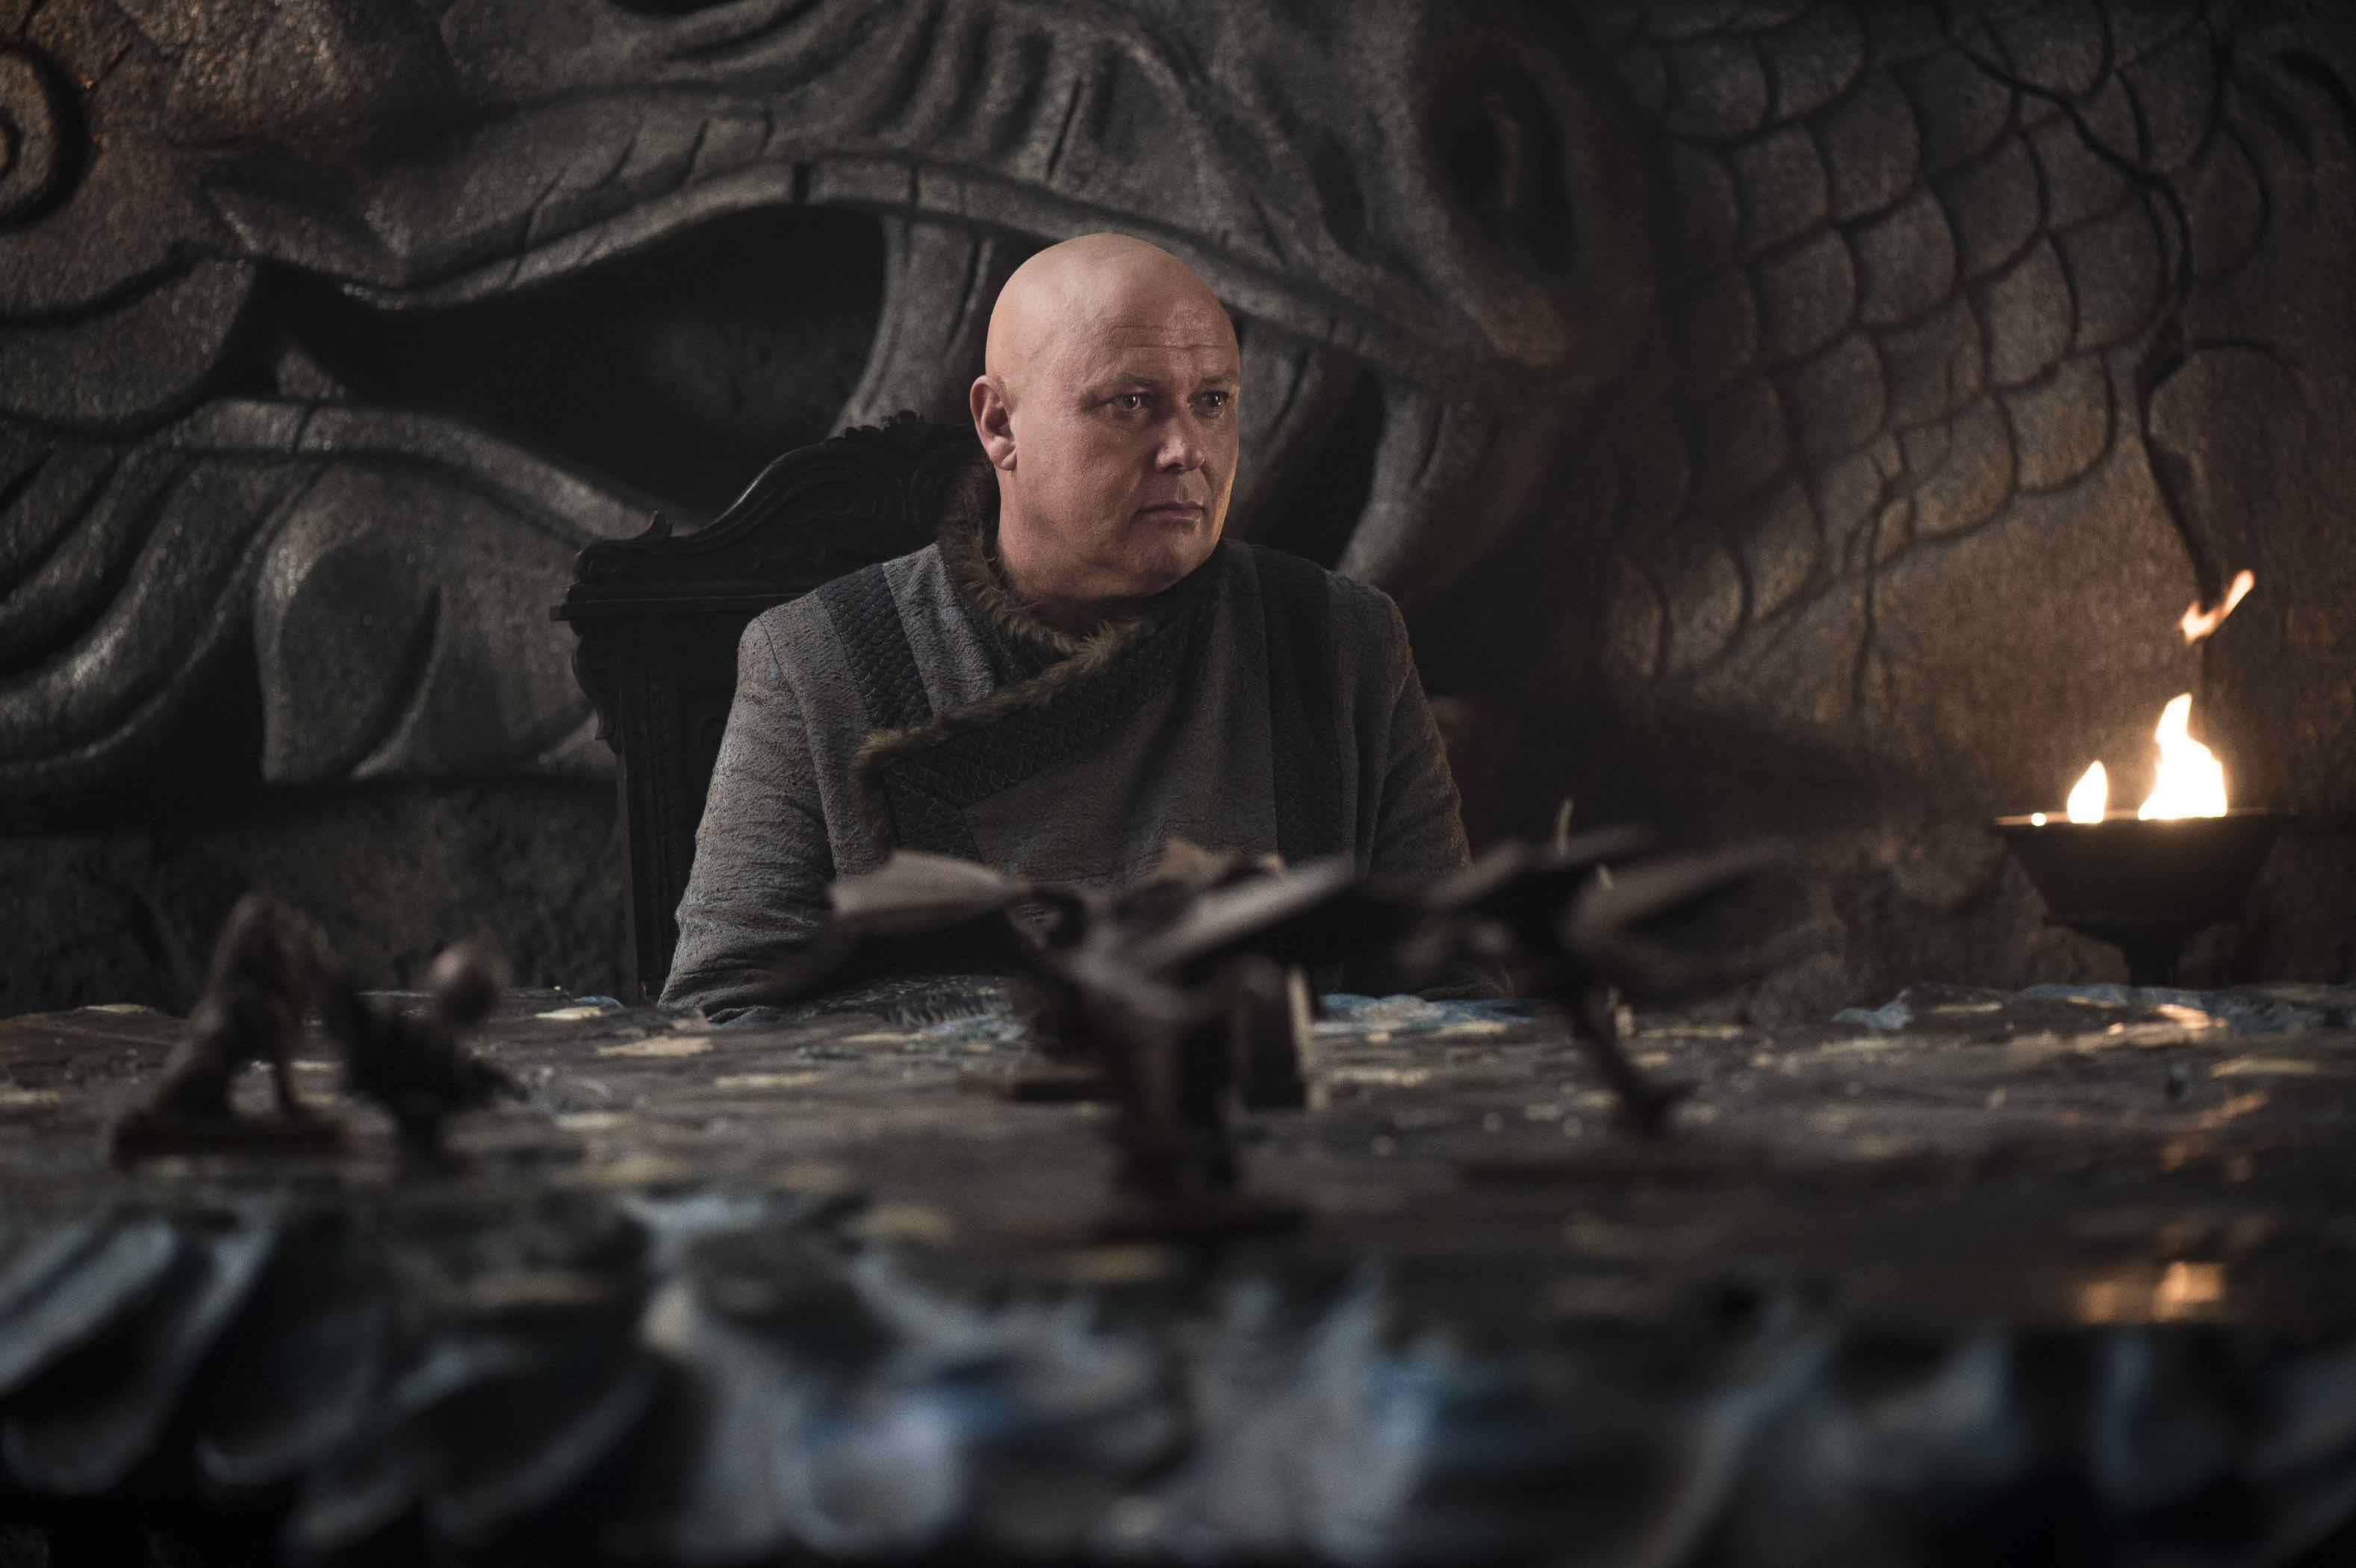 Igra prestolov (Game of Thrones, 7. sezona)